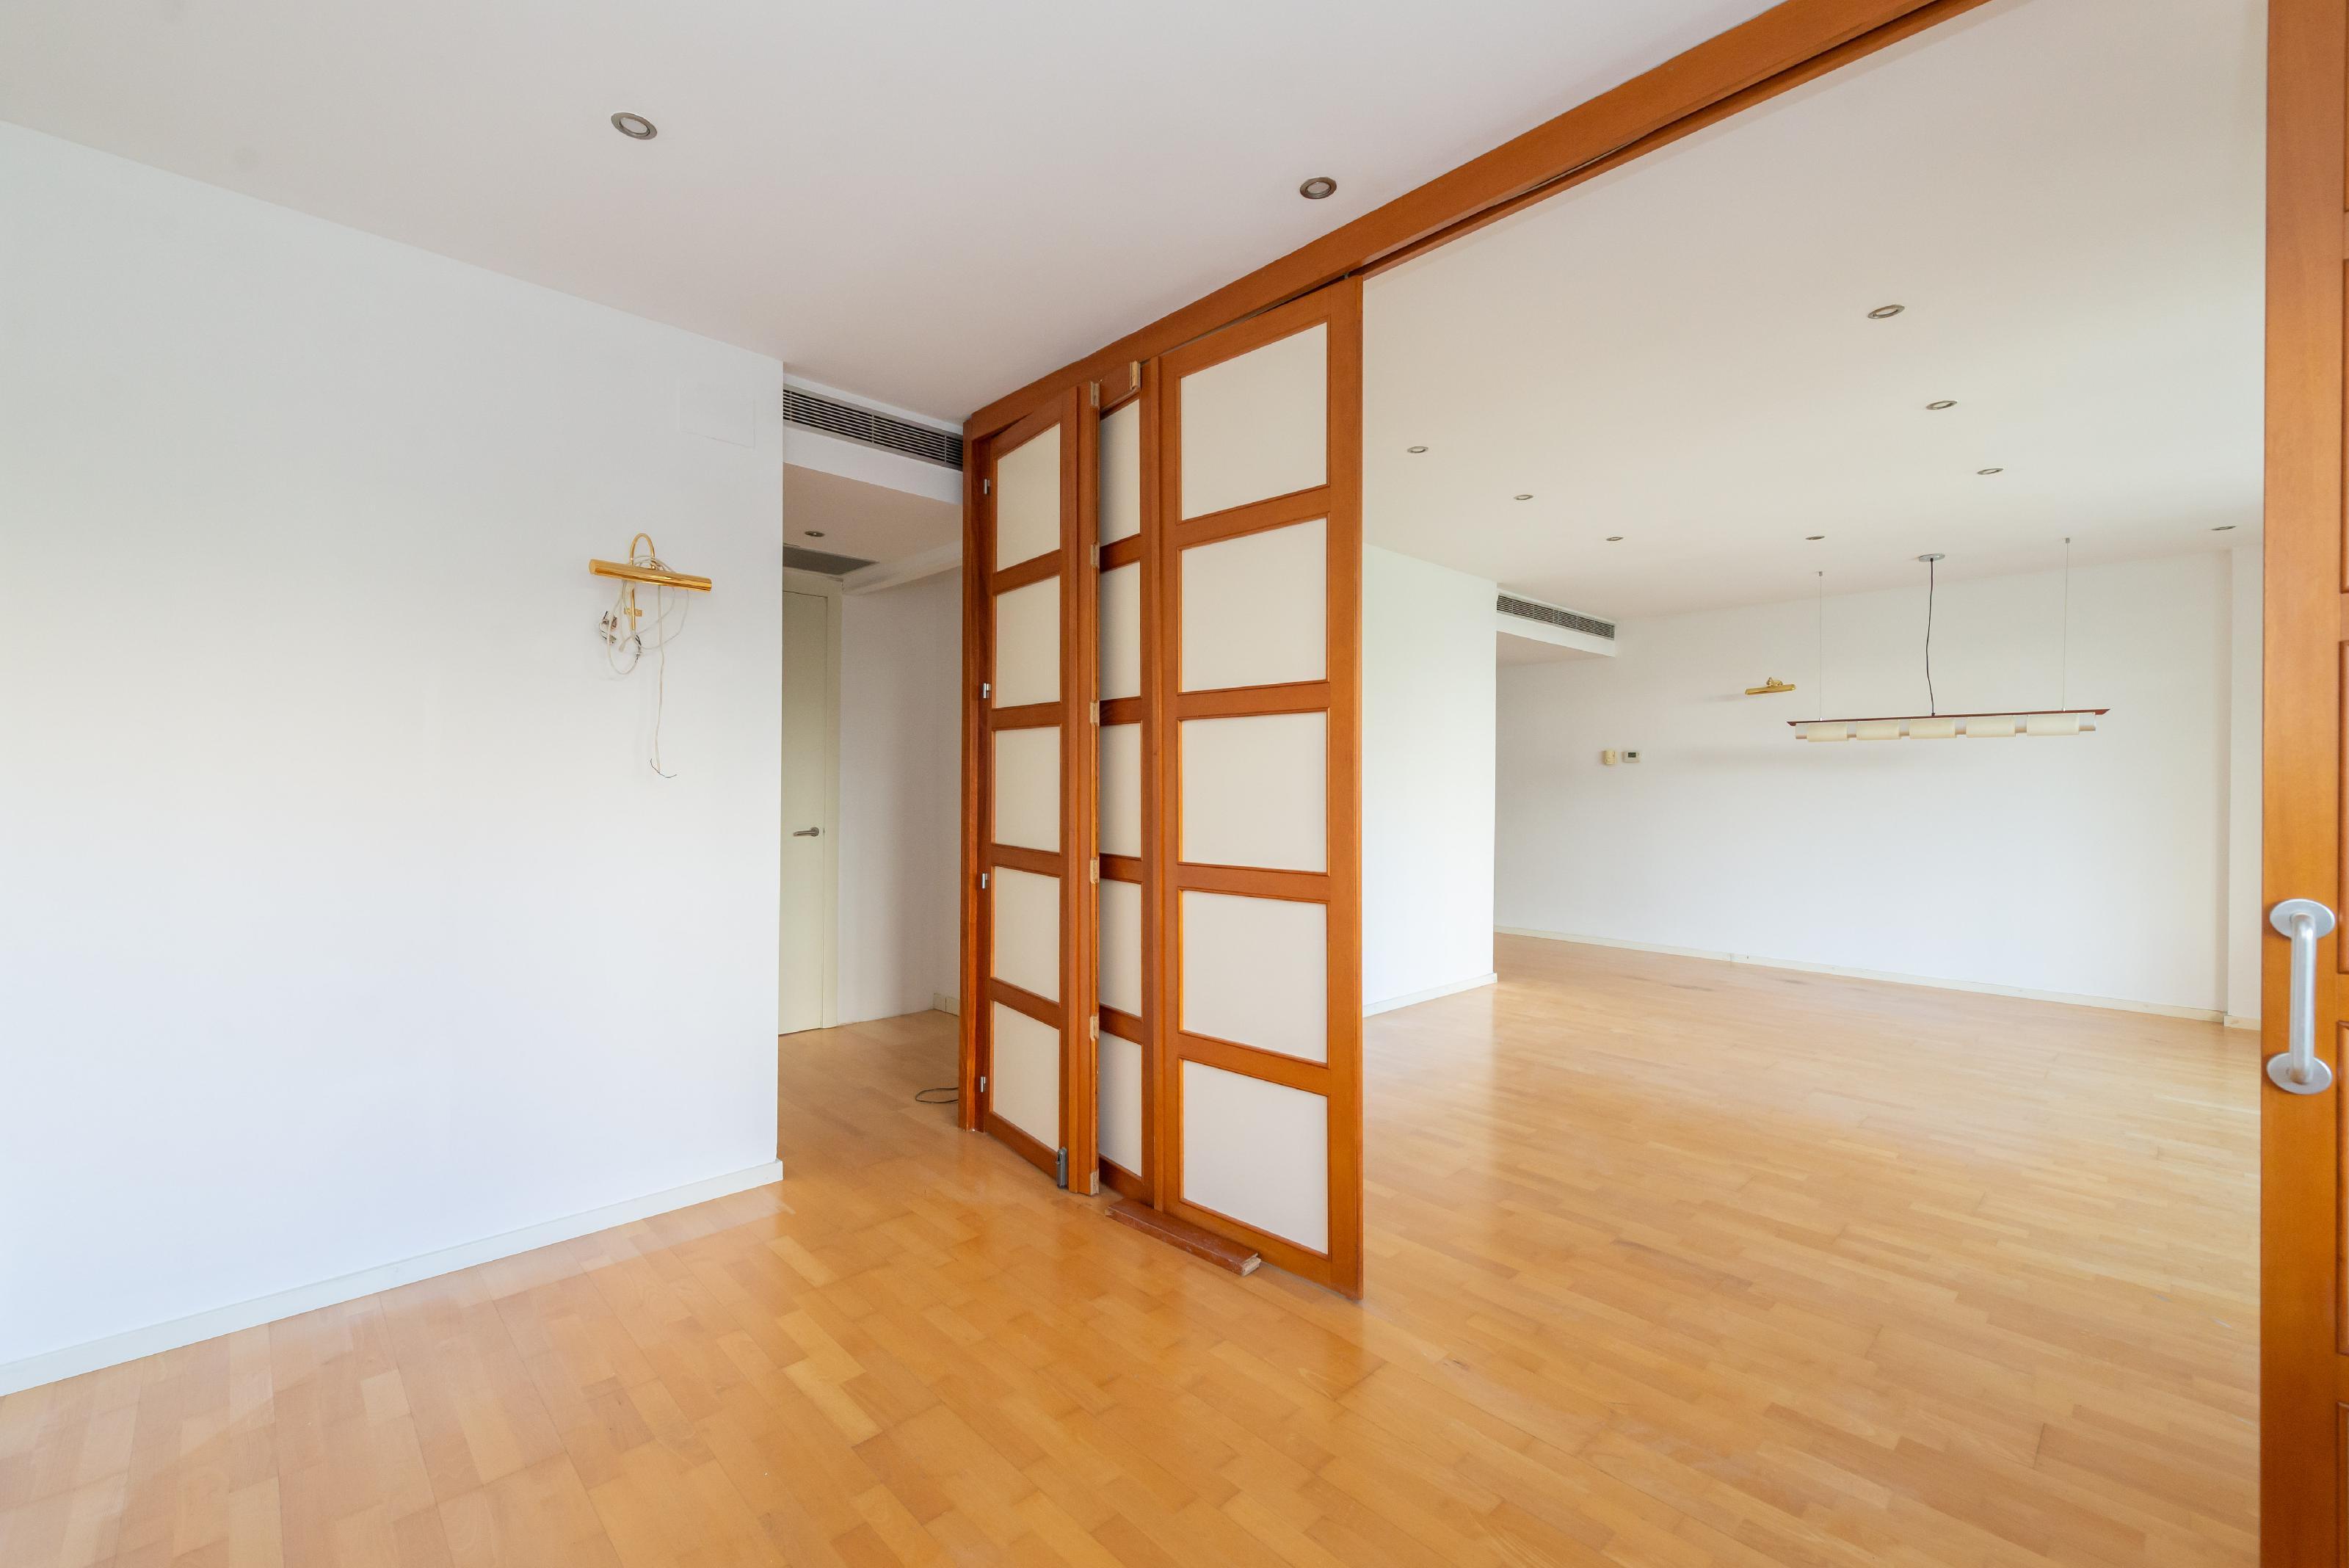 251446 Flat for sale in Sarrià-Sant Gervasi, Tres Torres 14